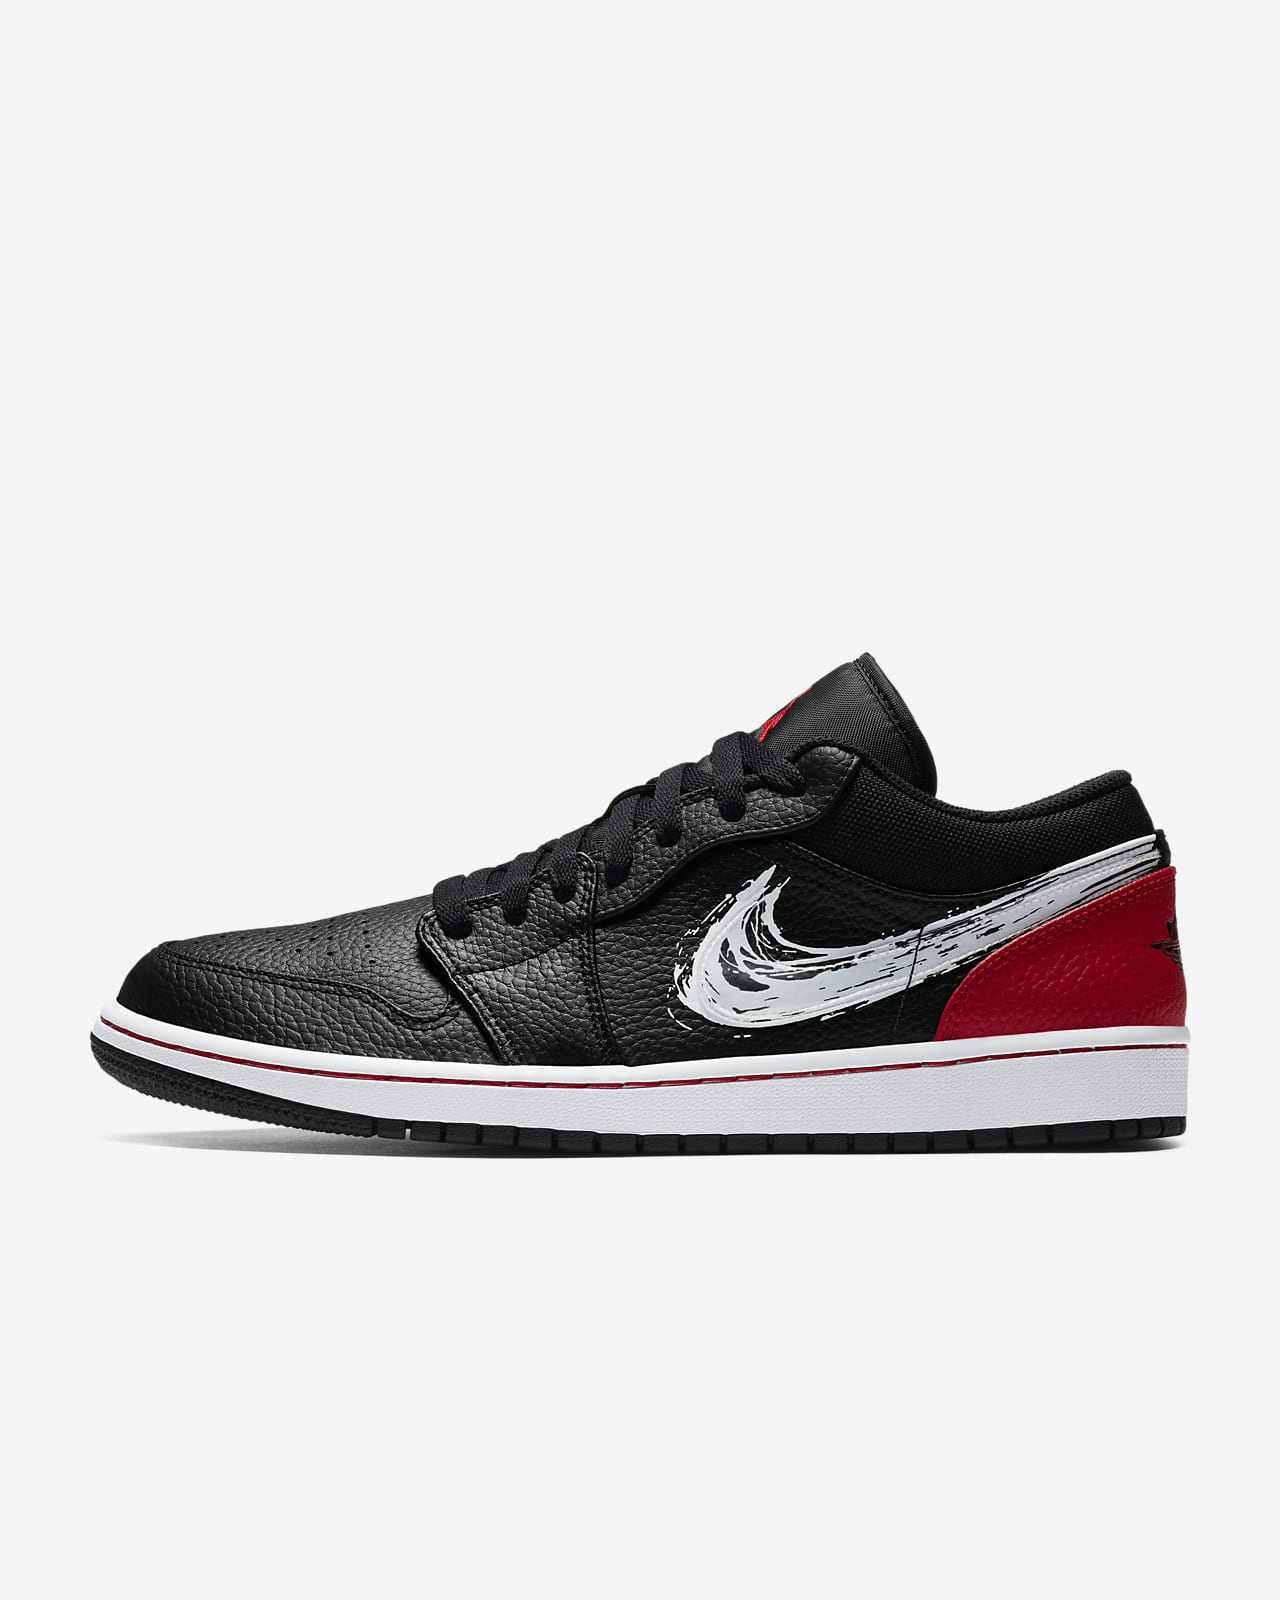 Air Jordan 1 Low SE férficipő